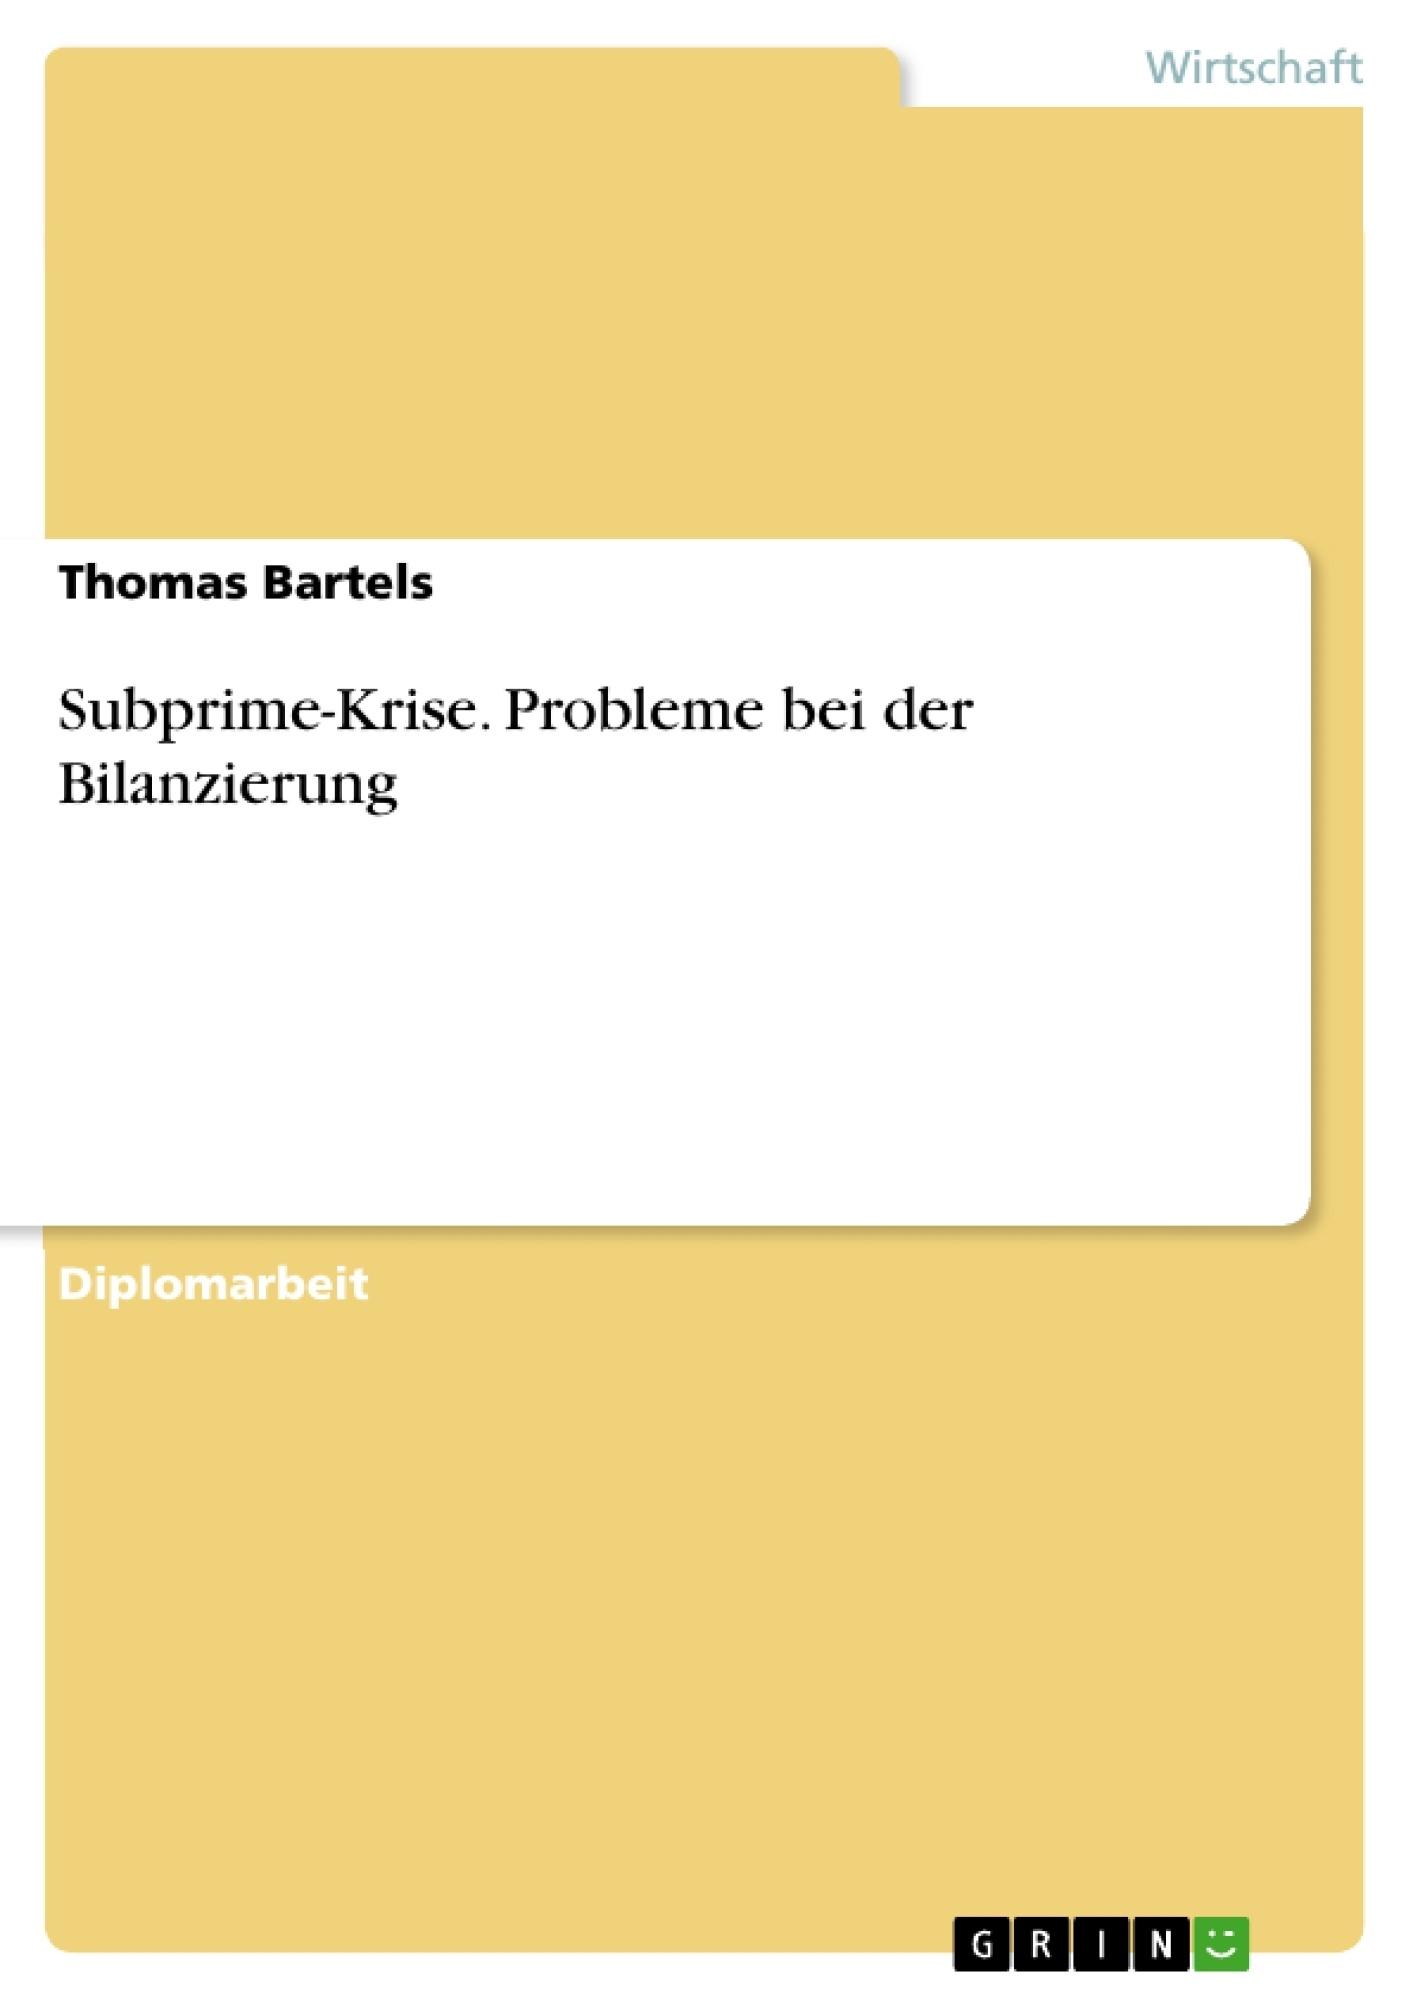 Titel: Subprime-Krise. Probleme bei der Bilanzierung